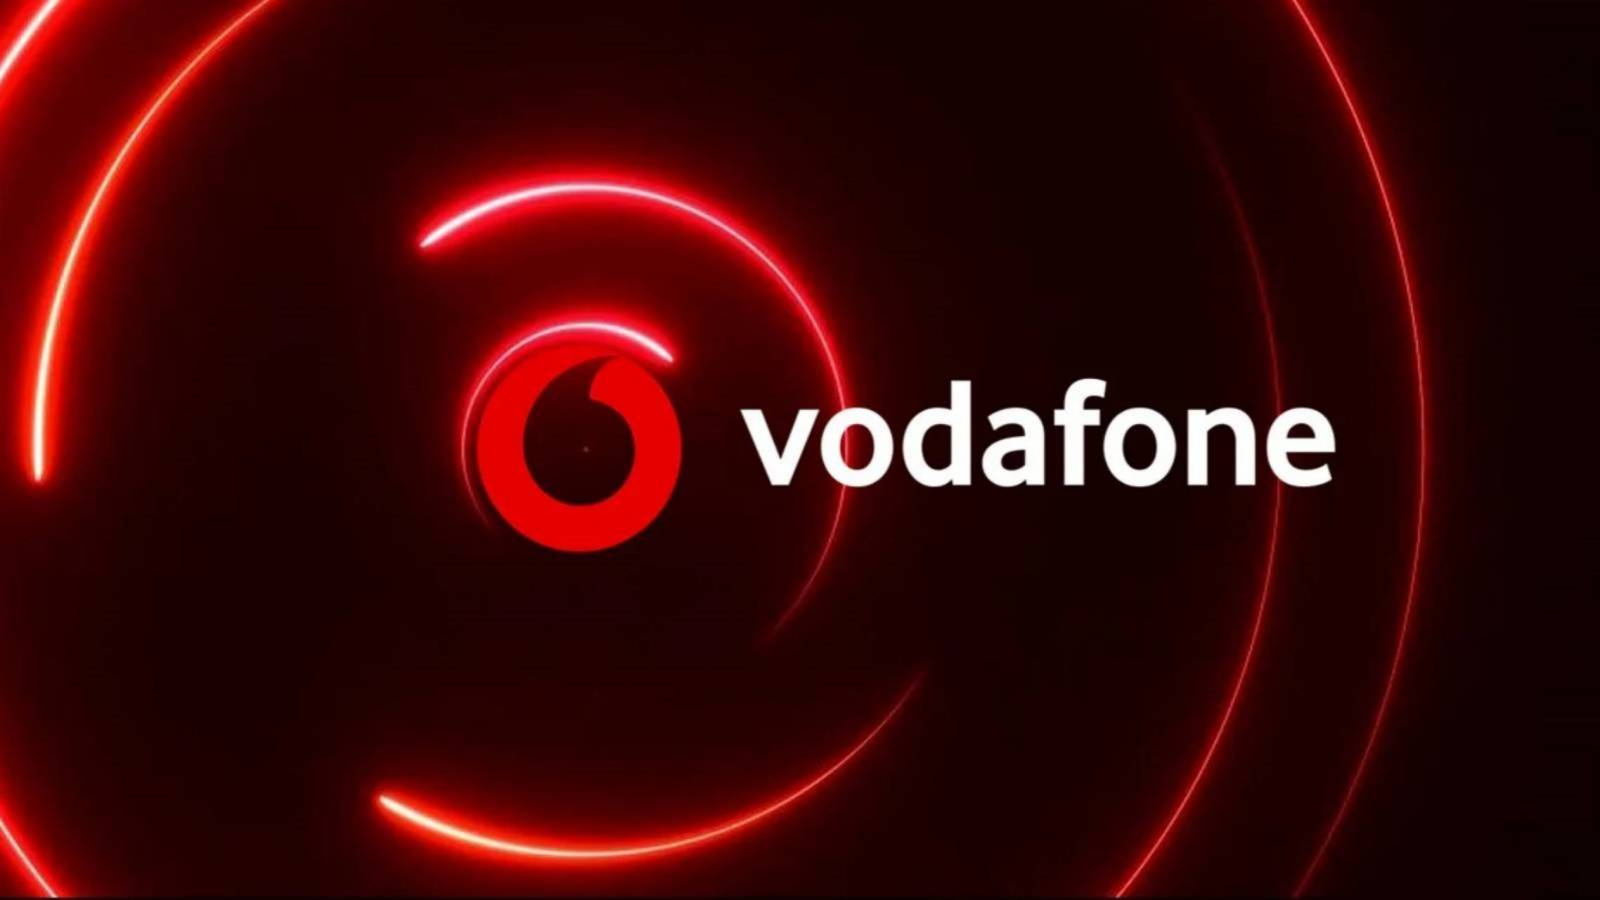 Vodafone ieftinire roaming